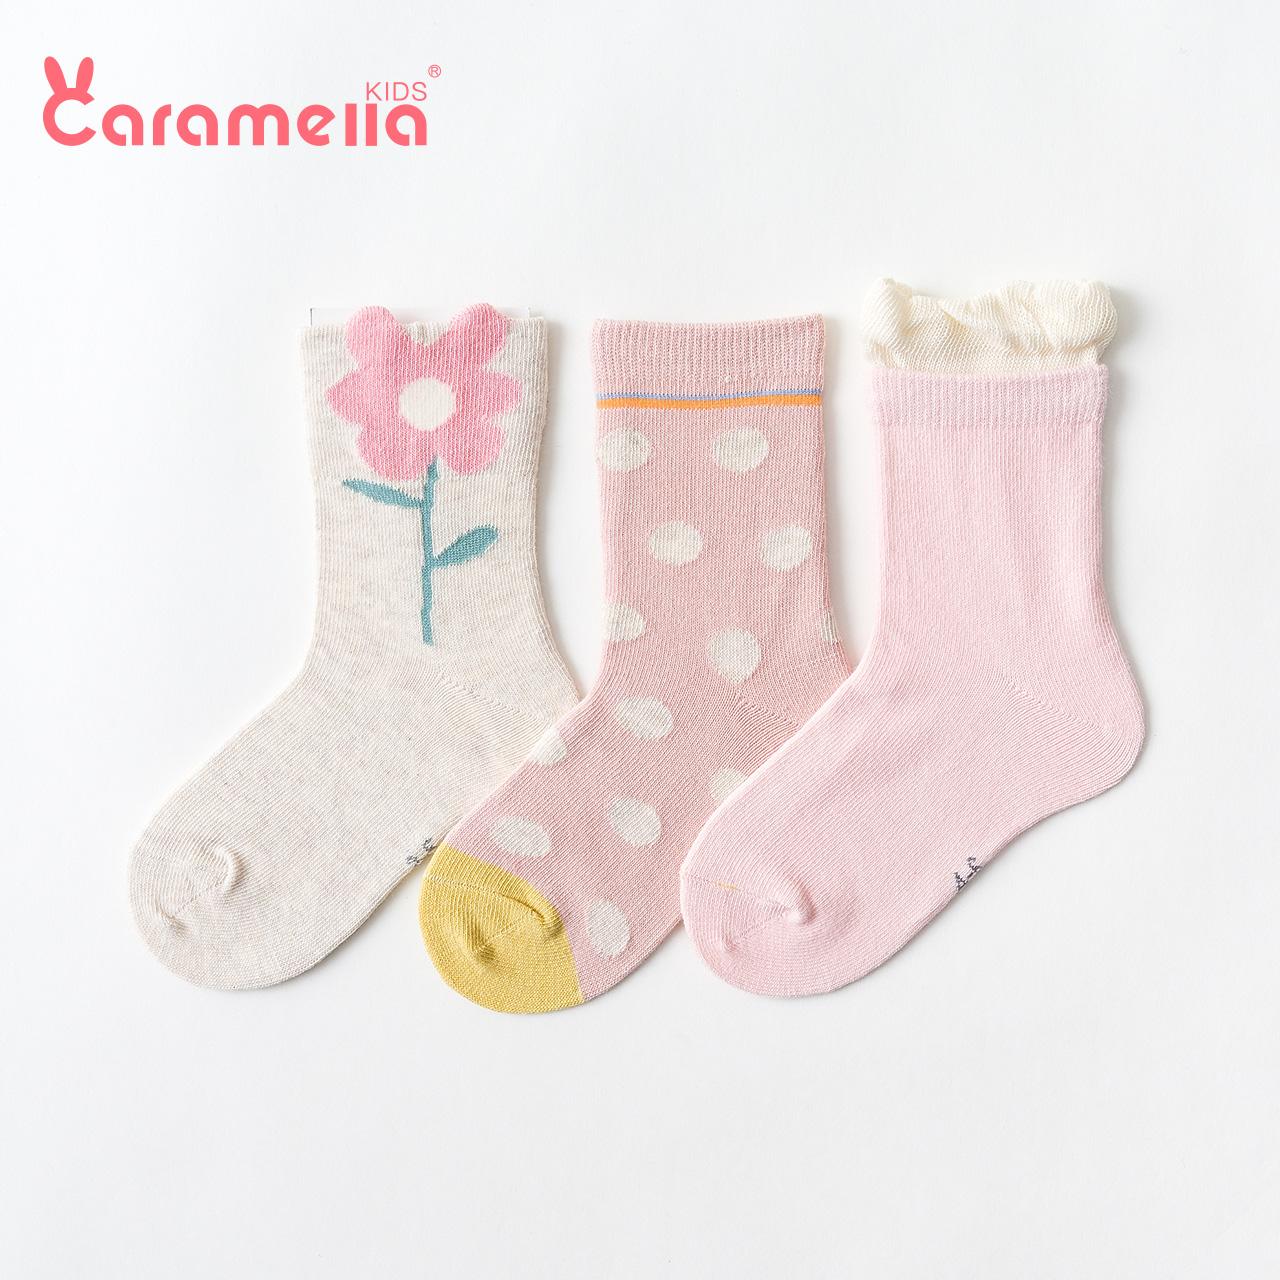 caramella宝宝袜子可爱超萌纯棉中筒袜秋冬婴儿袜子男女童袜